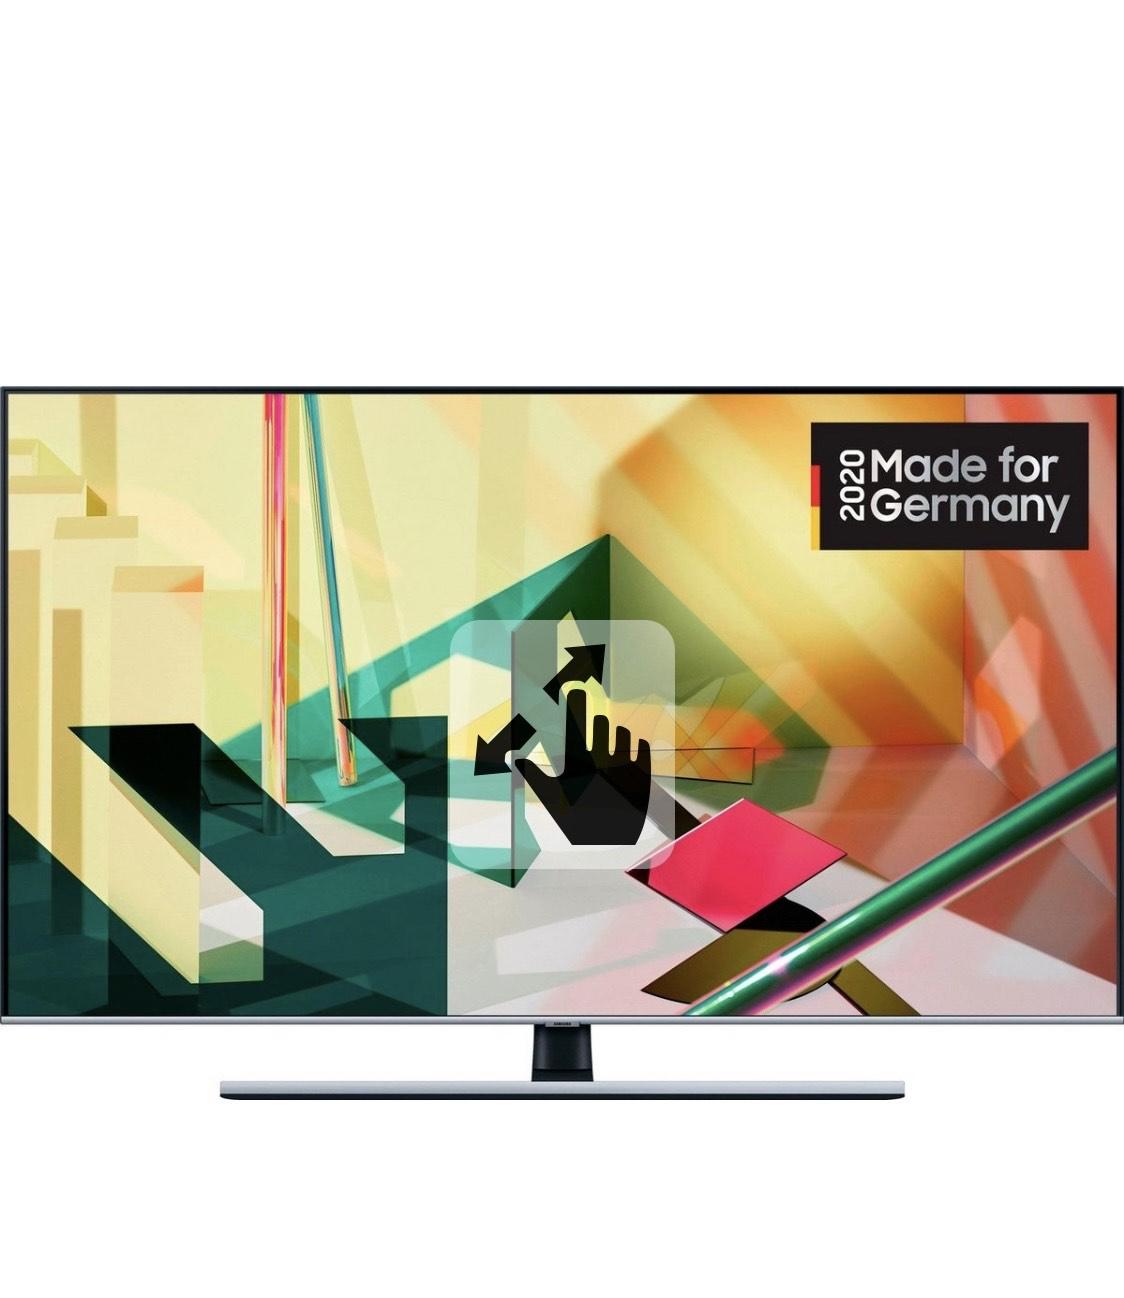 Samsung GQ65Q75T QLED-Fernseher (163 cm/65 Zoll, 4K Ultra HD, Smart-TV) 100 Hz, HDMI 2.1